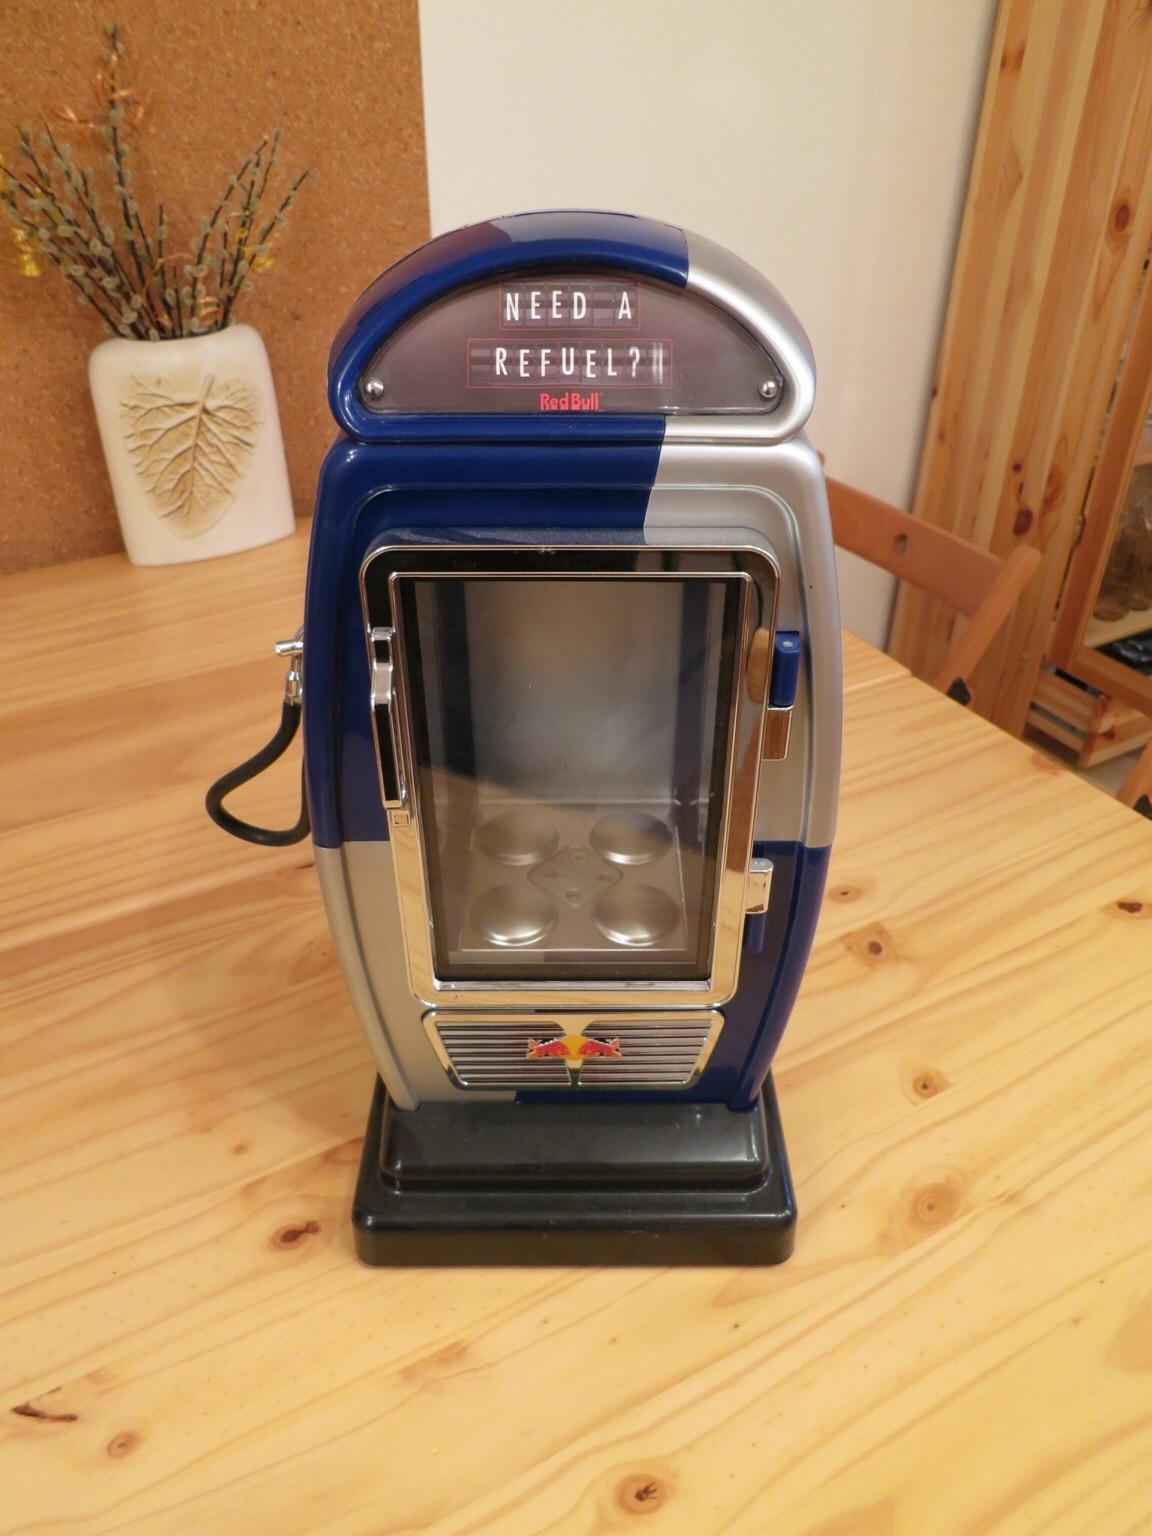 Red Bull Kleiner Kühlschrank : Mini kühlschrank red bull dose: beliebt mini kühlschrank red bull